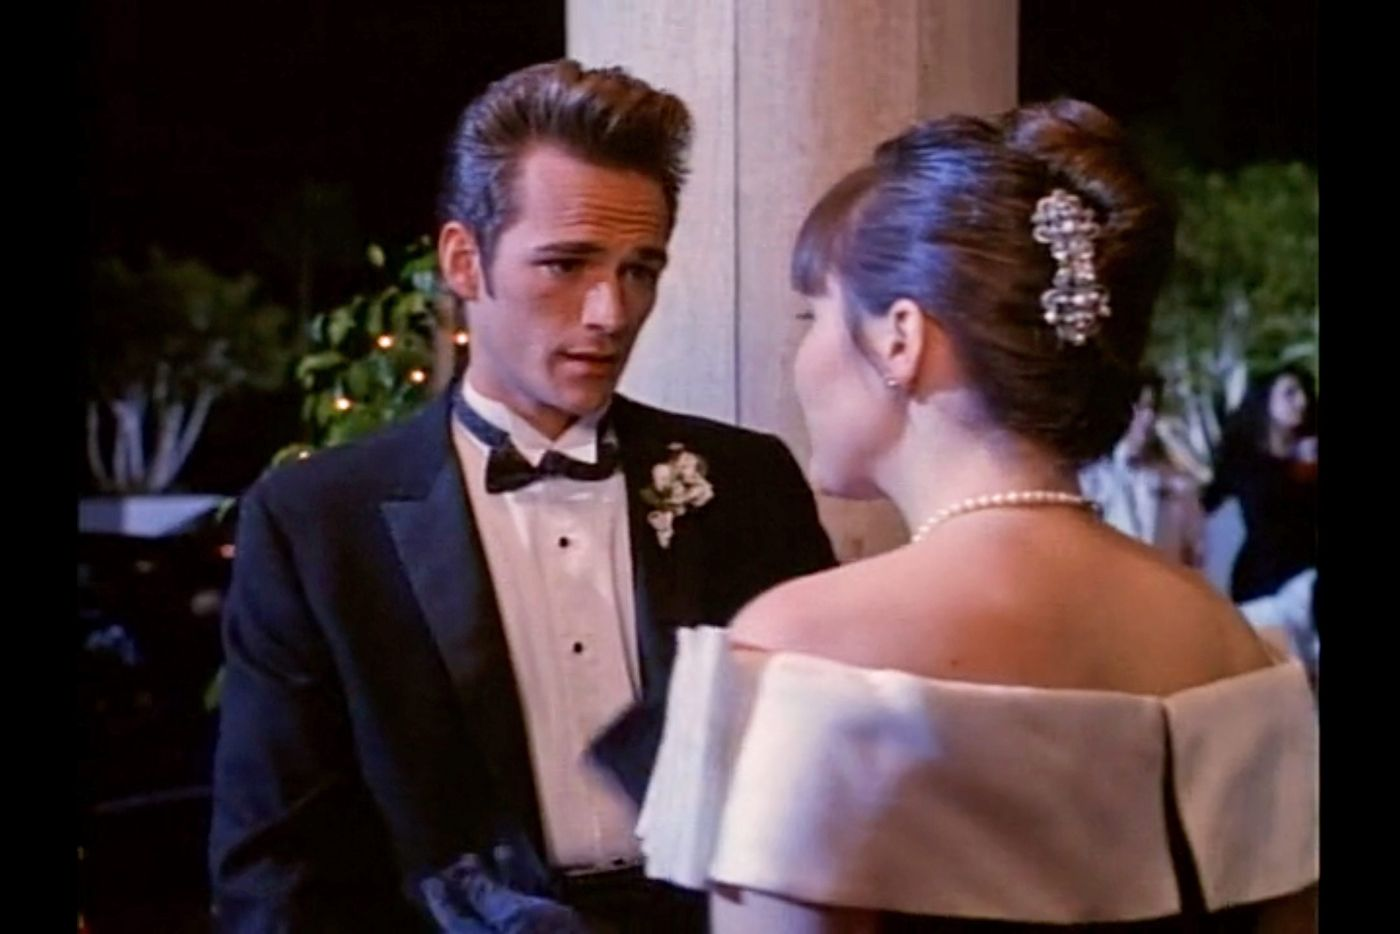 Luke Perry's Best Beverly Hills 90210 Episodes